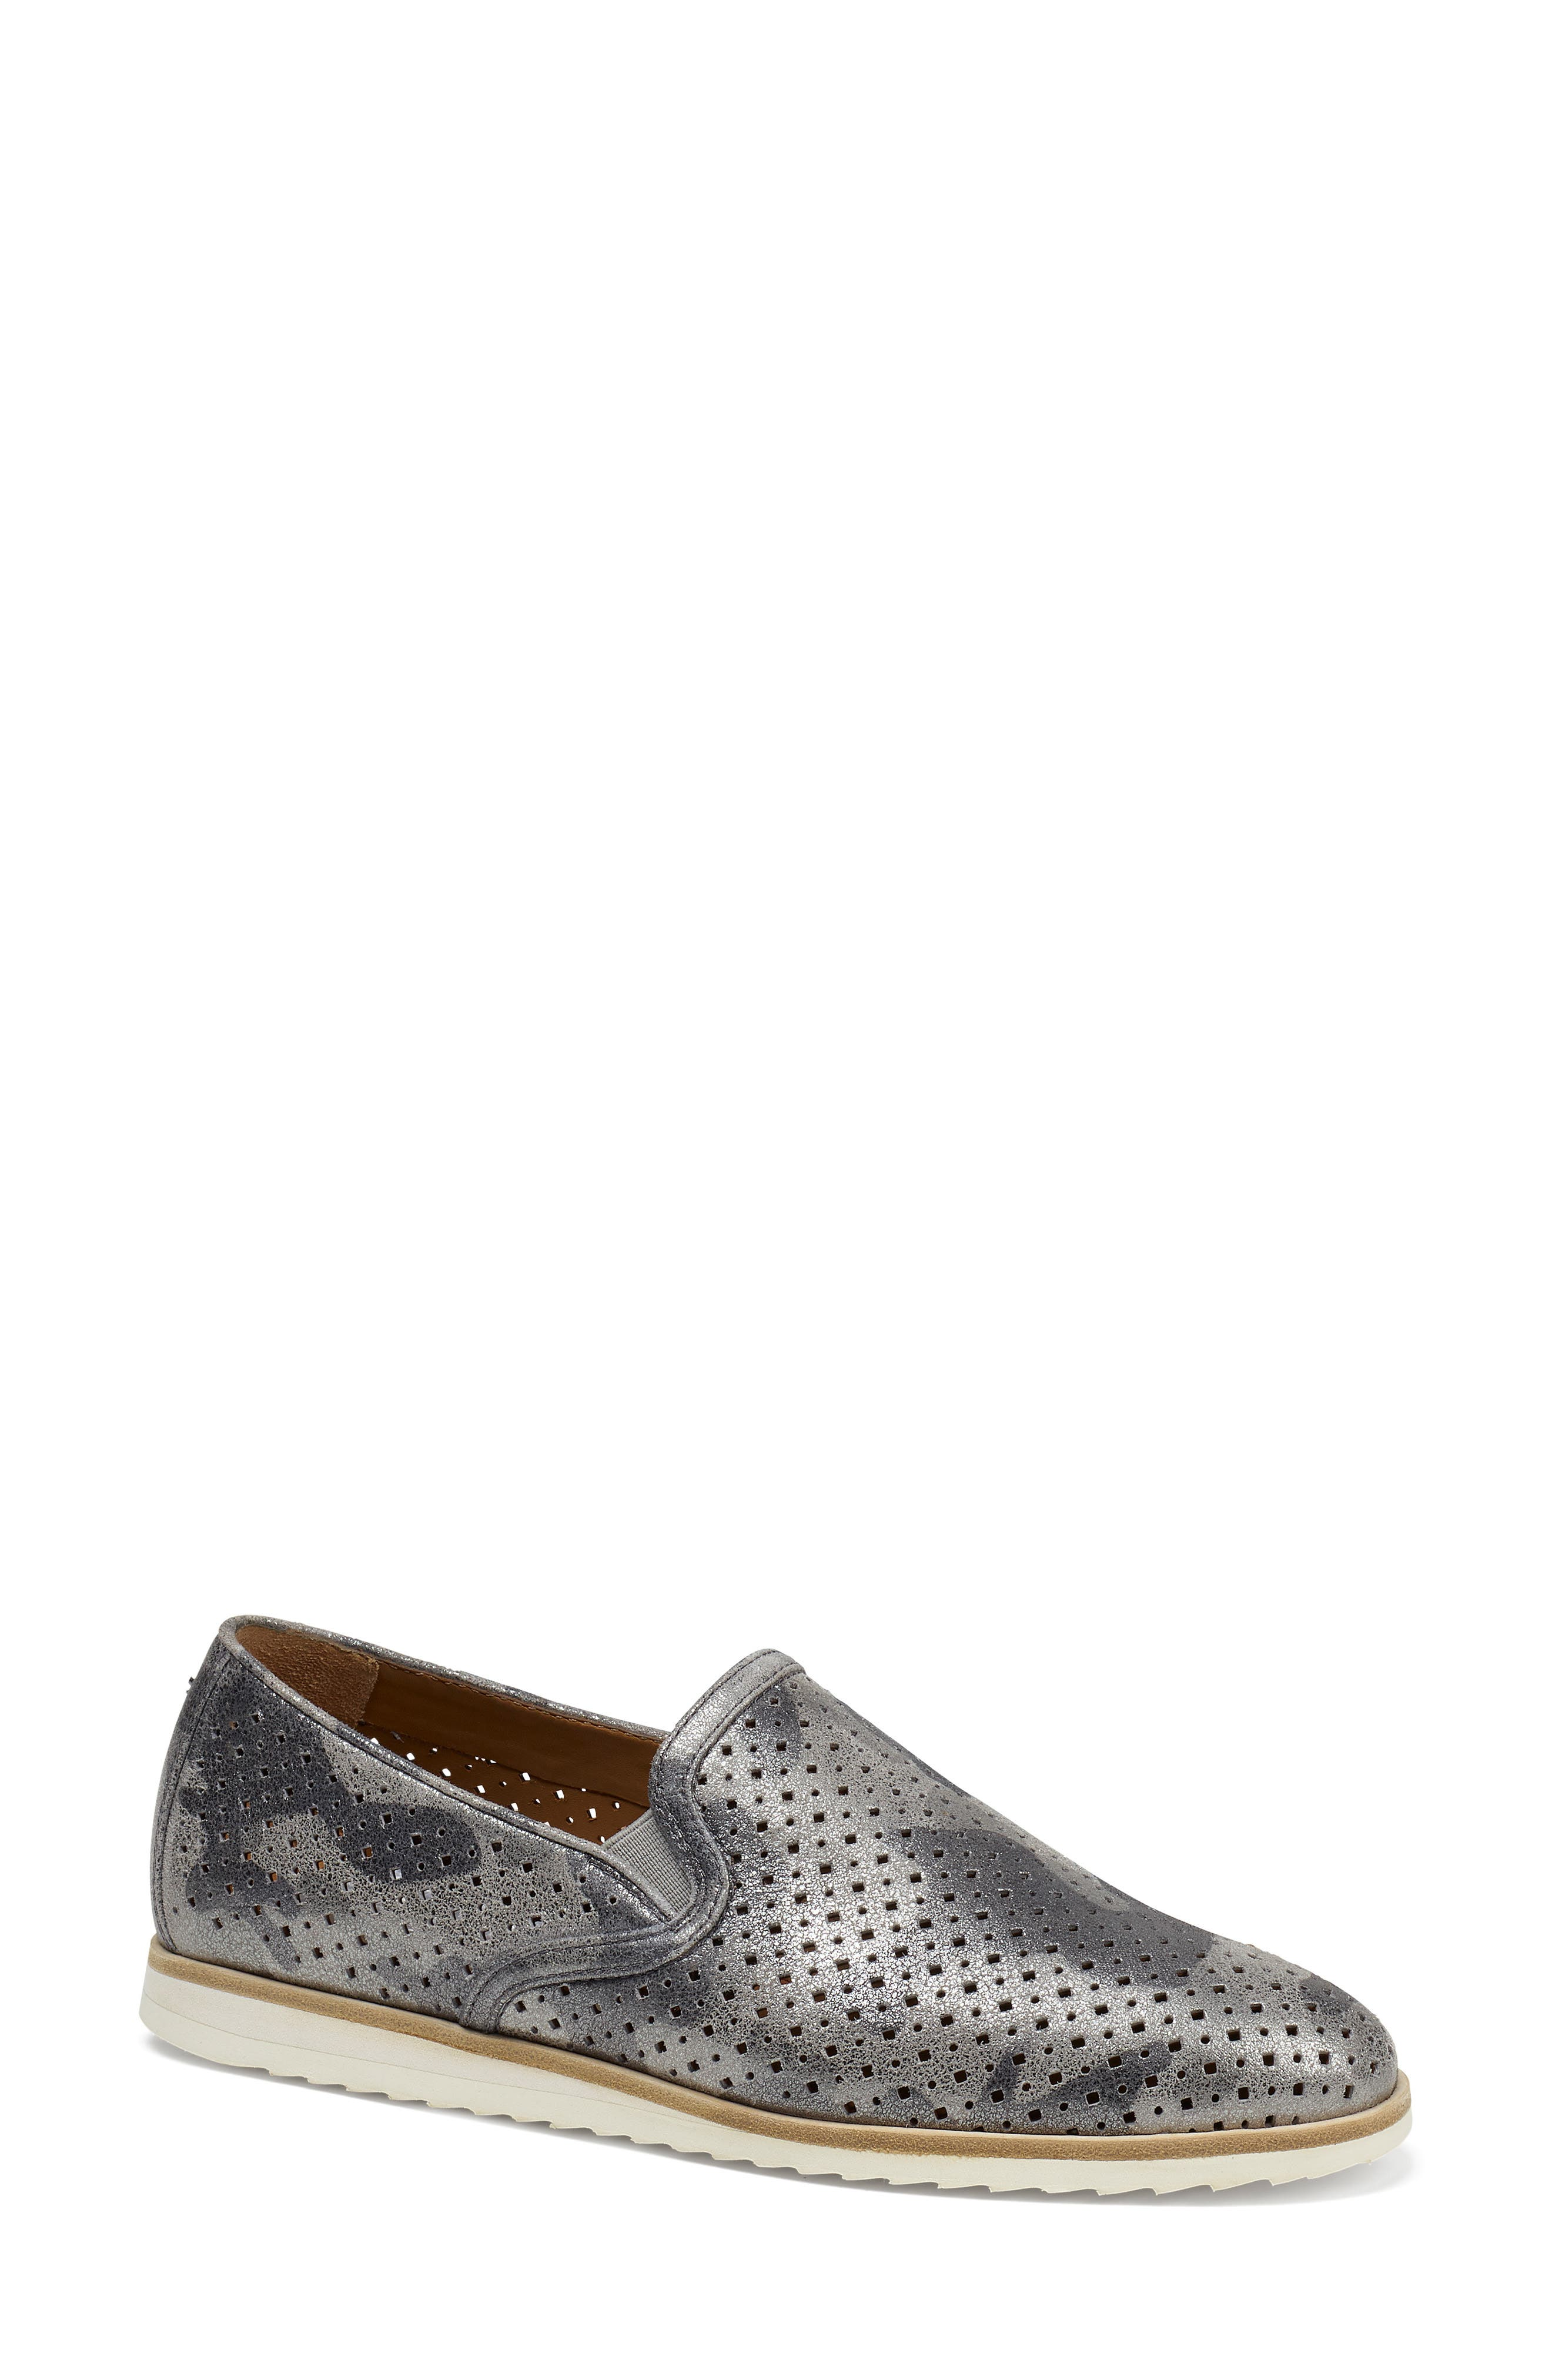 Trask Andi Perforated Flat, Grey